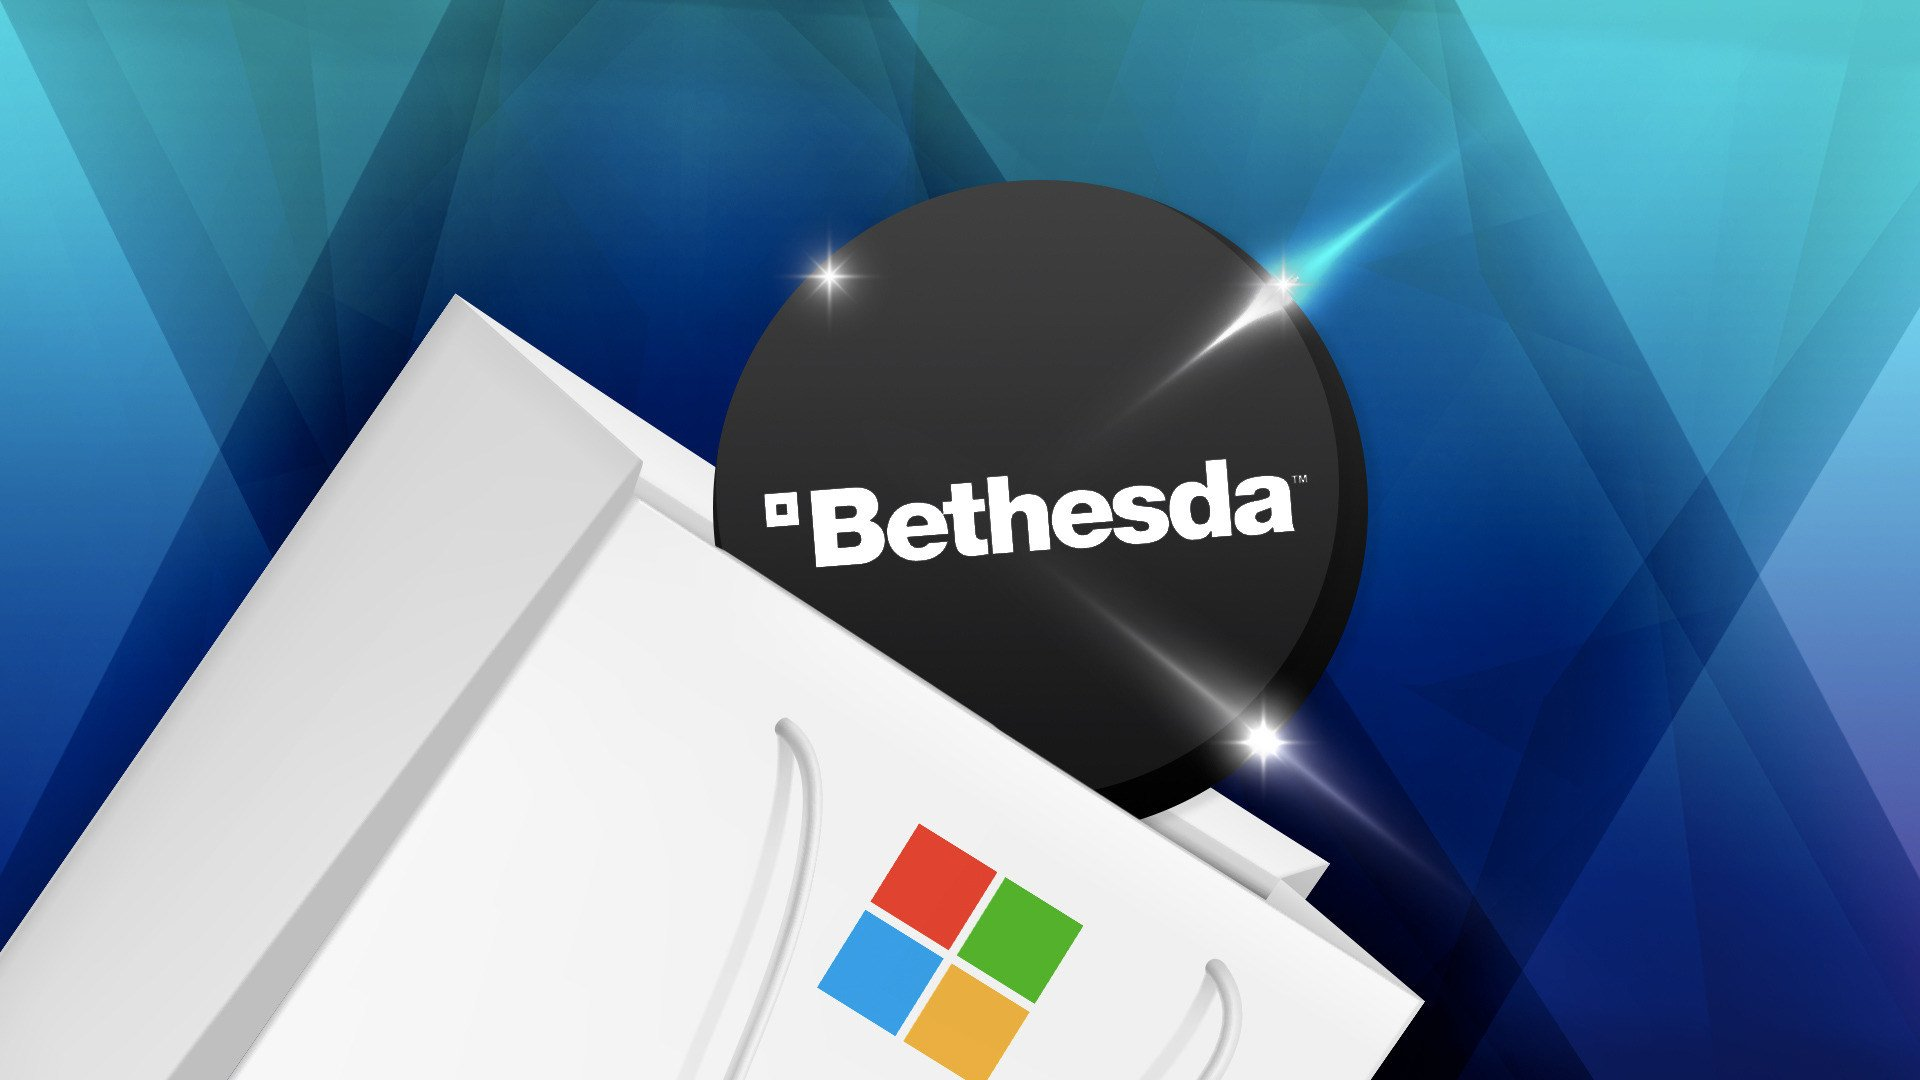 Microsoft, Microsoft Corporation, übernahme, Bethesda, Zenimax